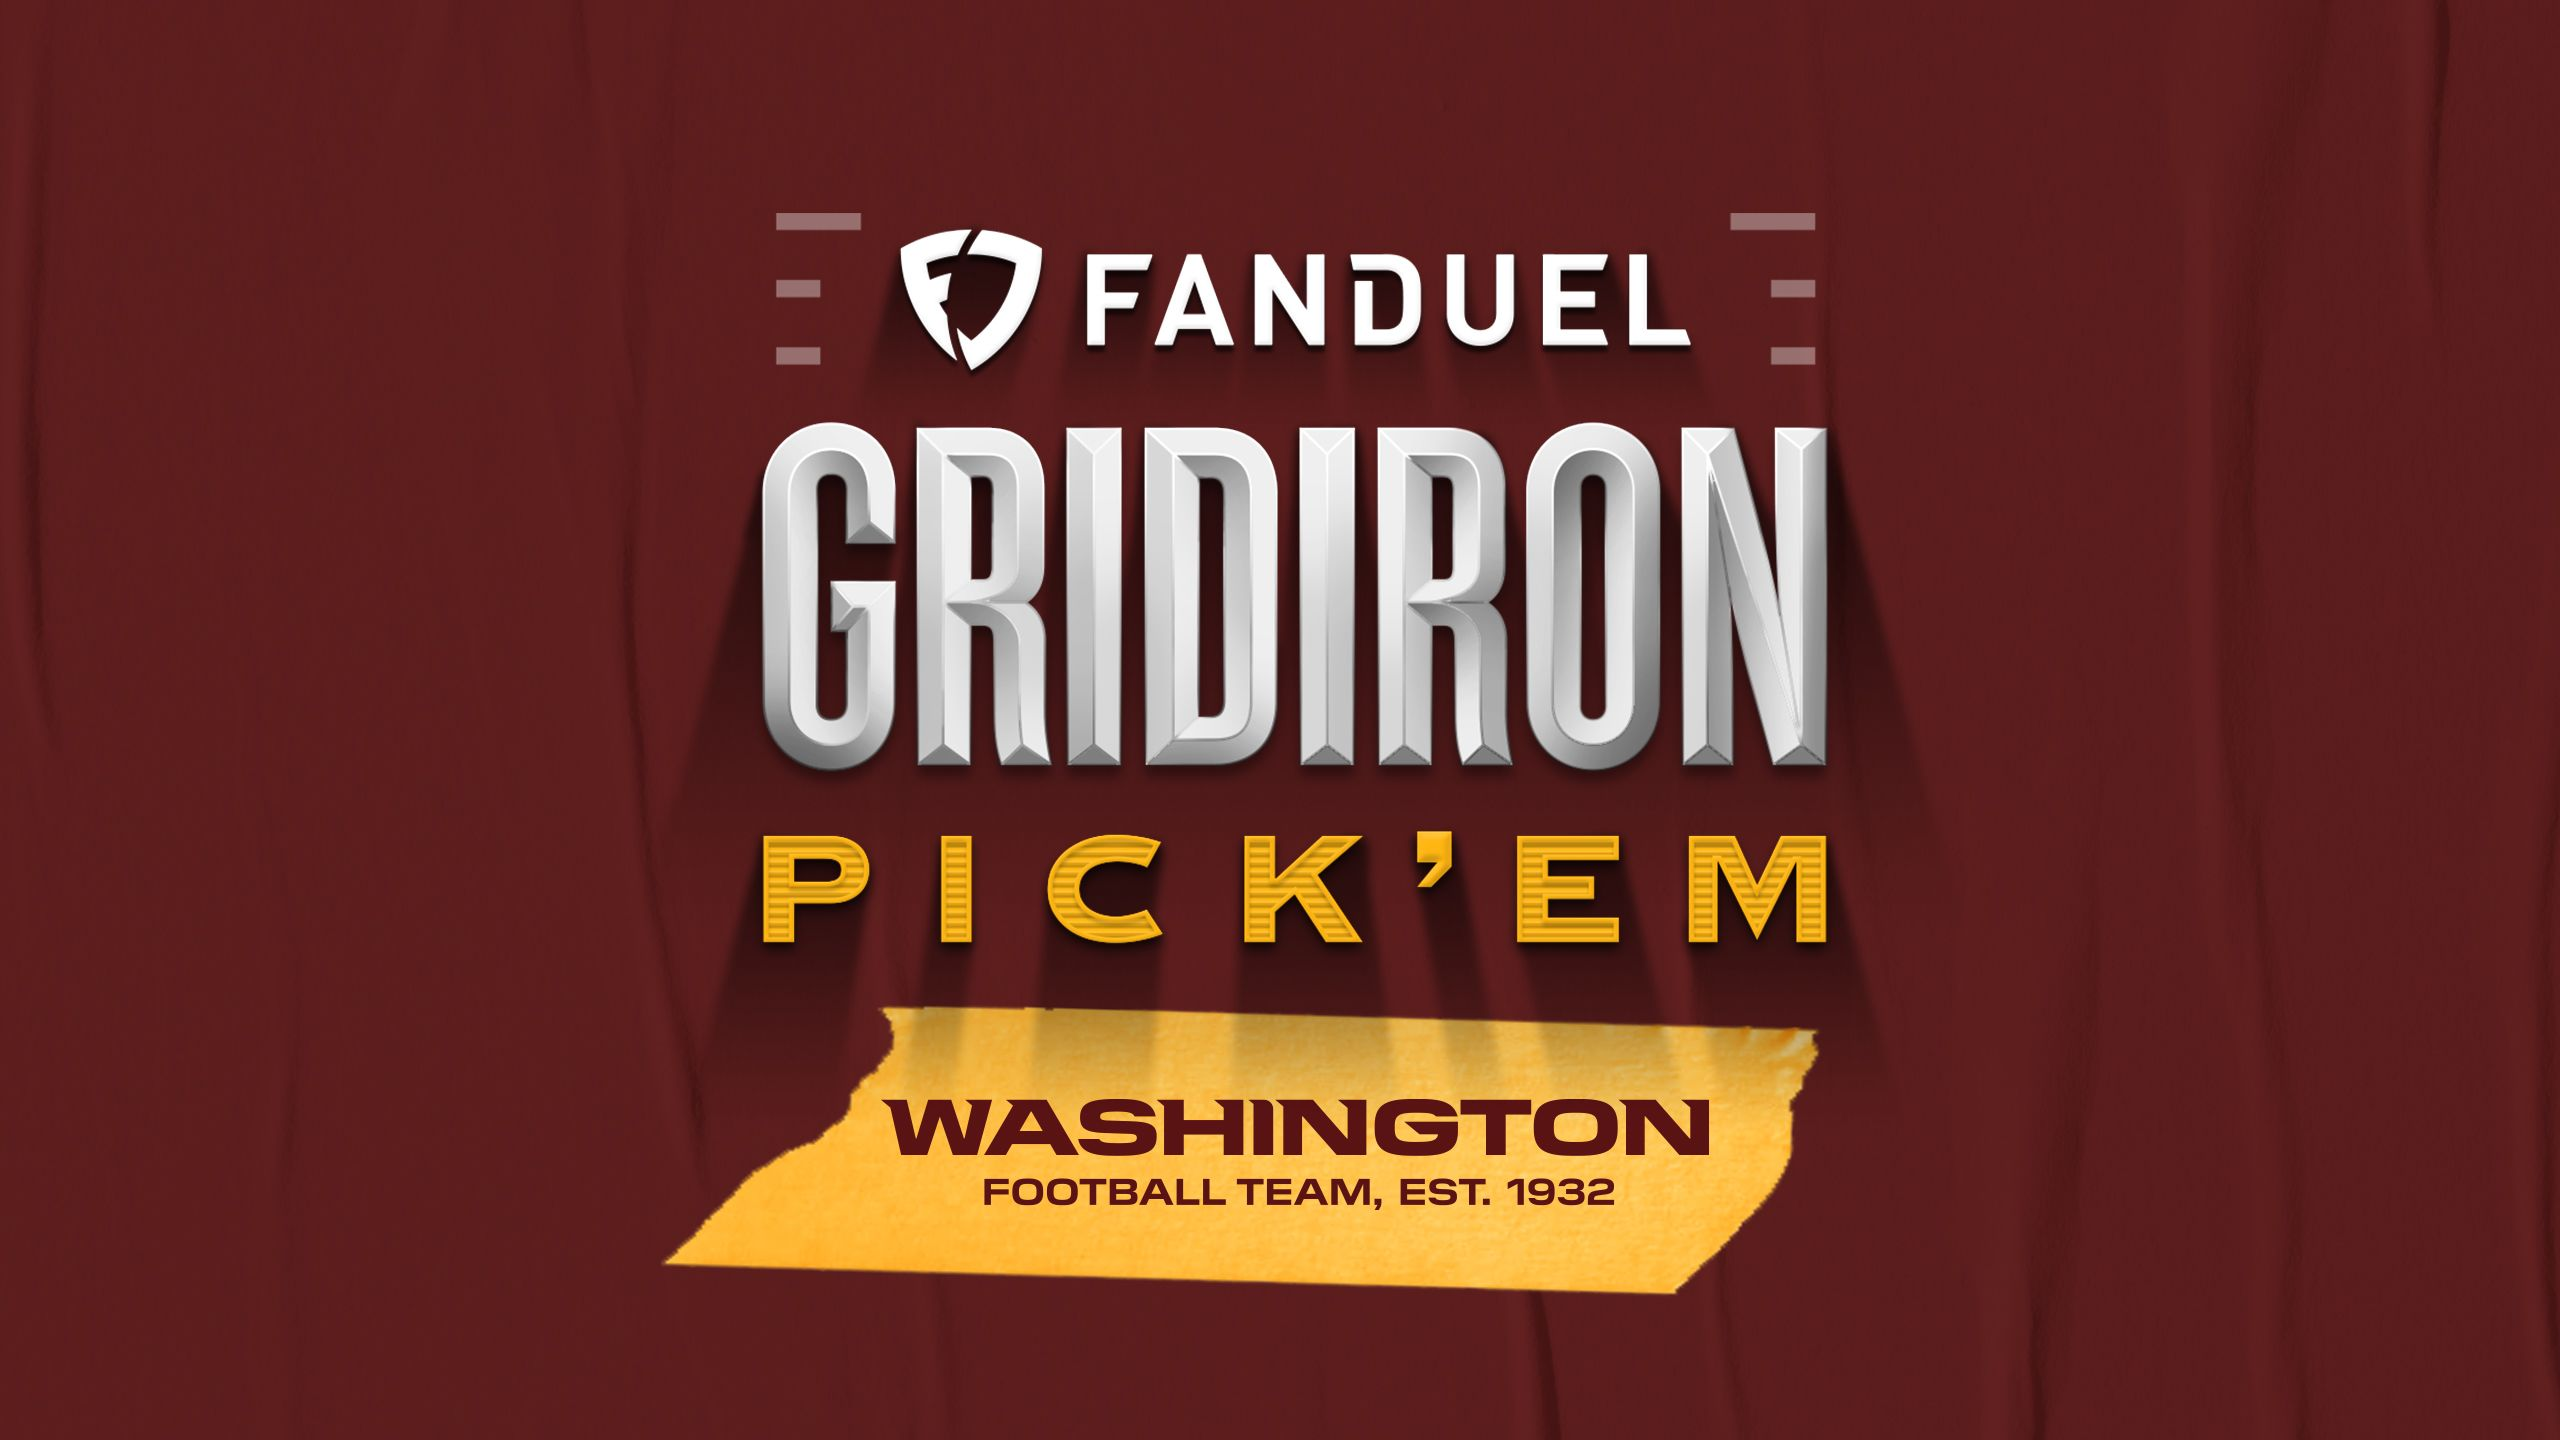 FanDuel_GridIronPick'Em_AppRotator_2560x1440